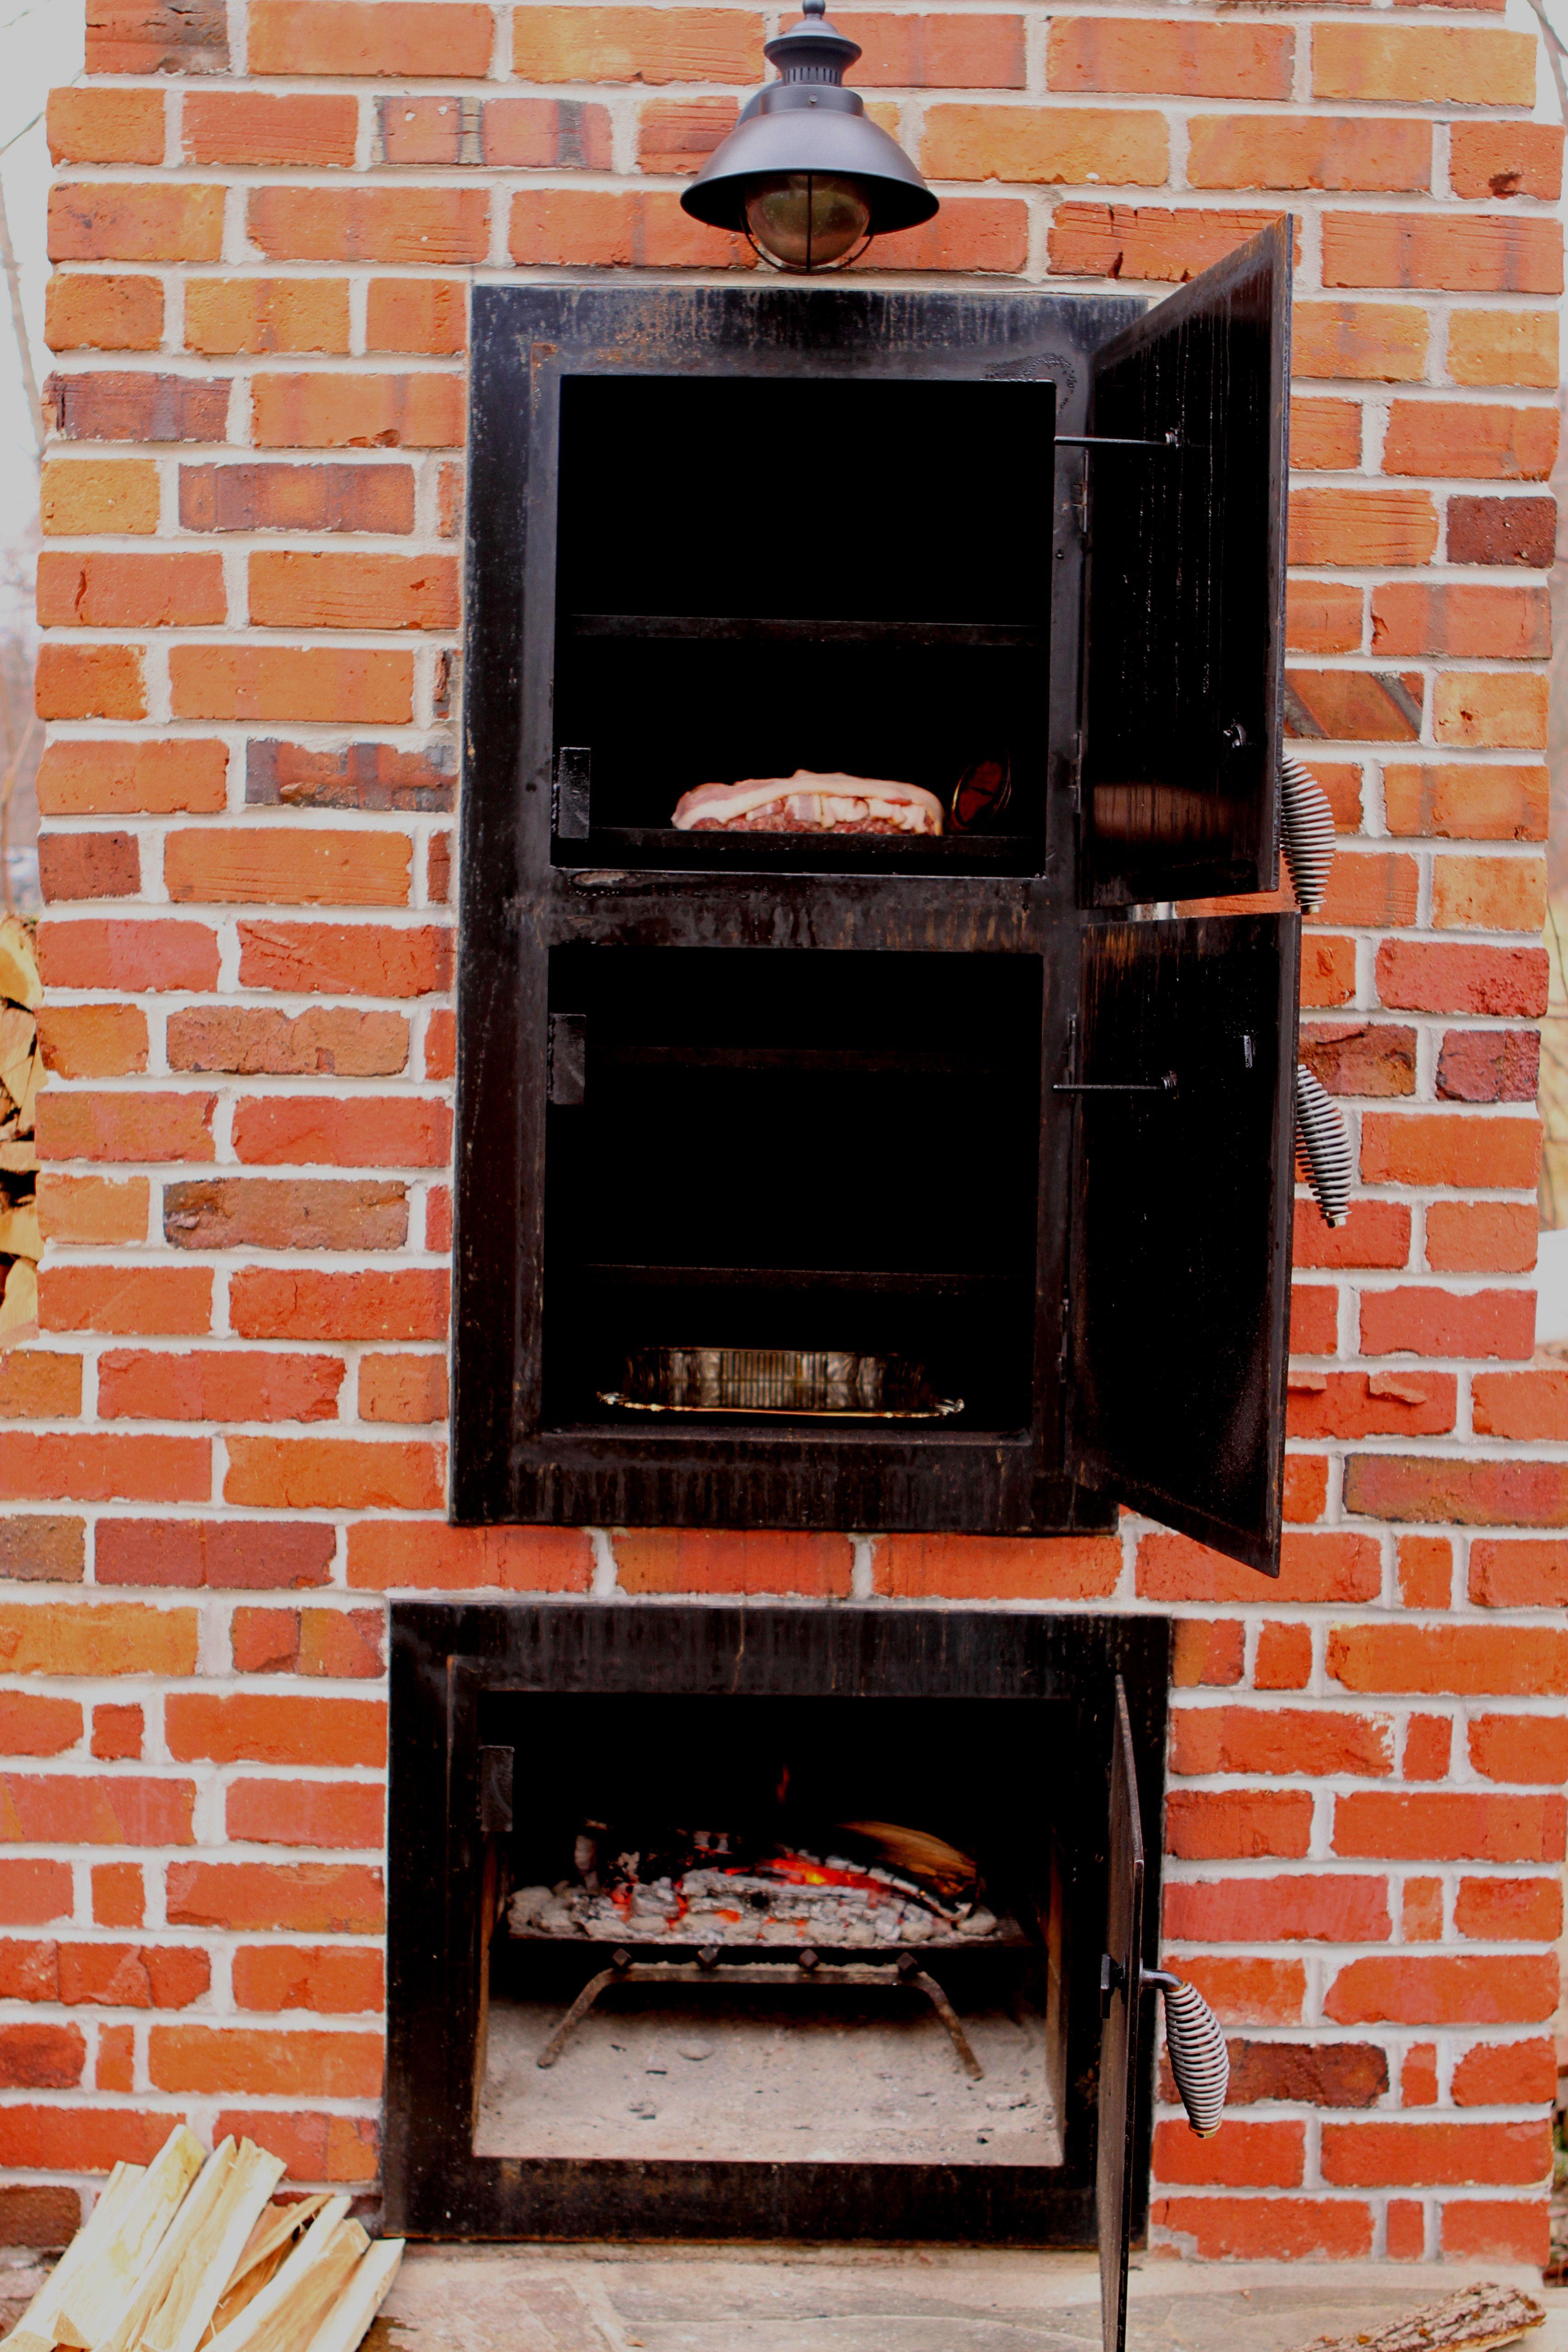 Brick smoker compete how to brick smoker backyard